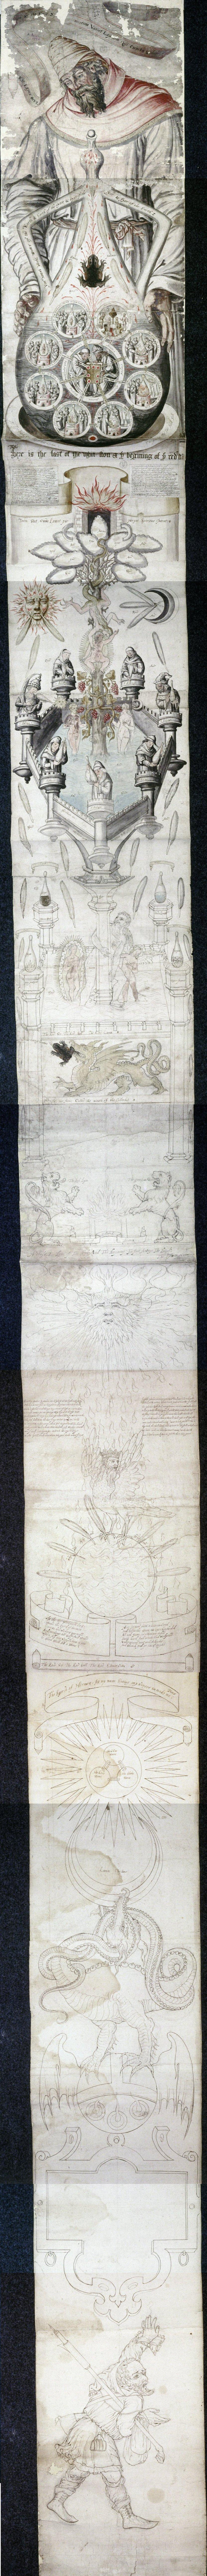 MS. Ash. Rolls 40, Bodleian Library